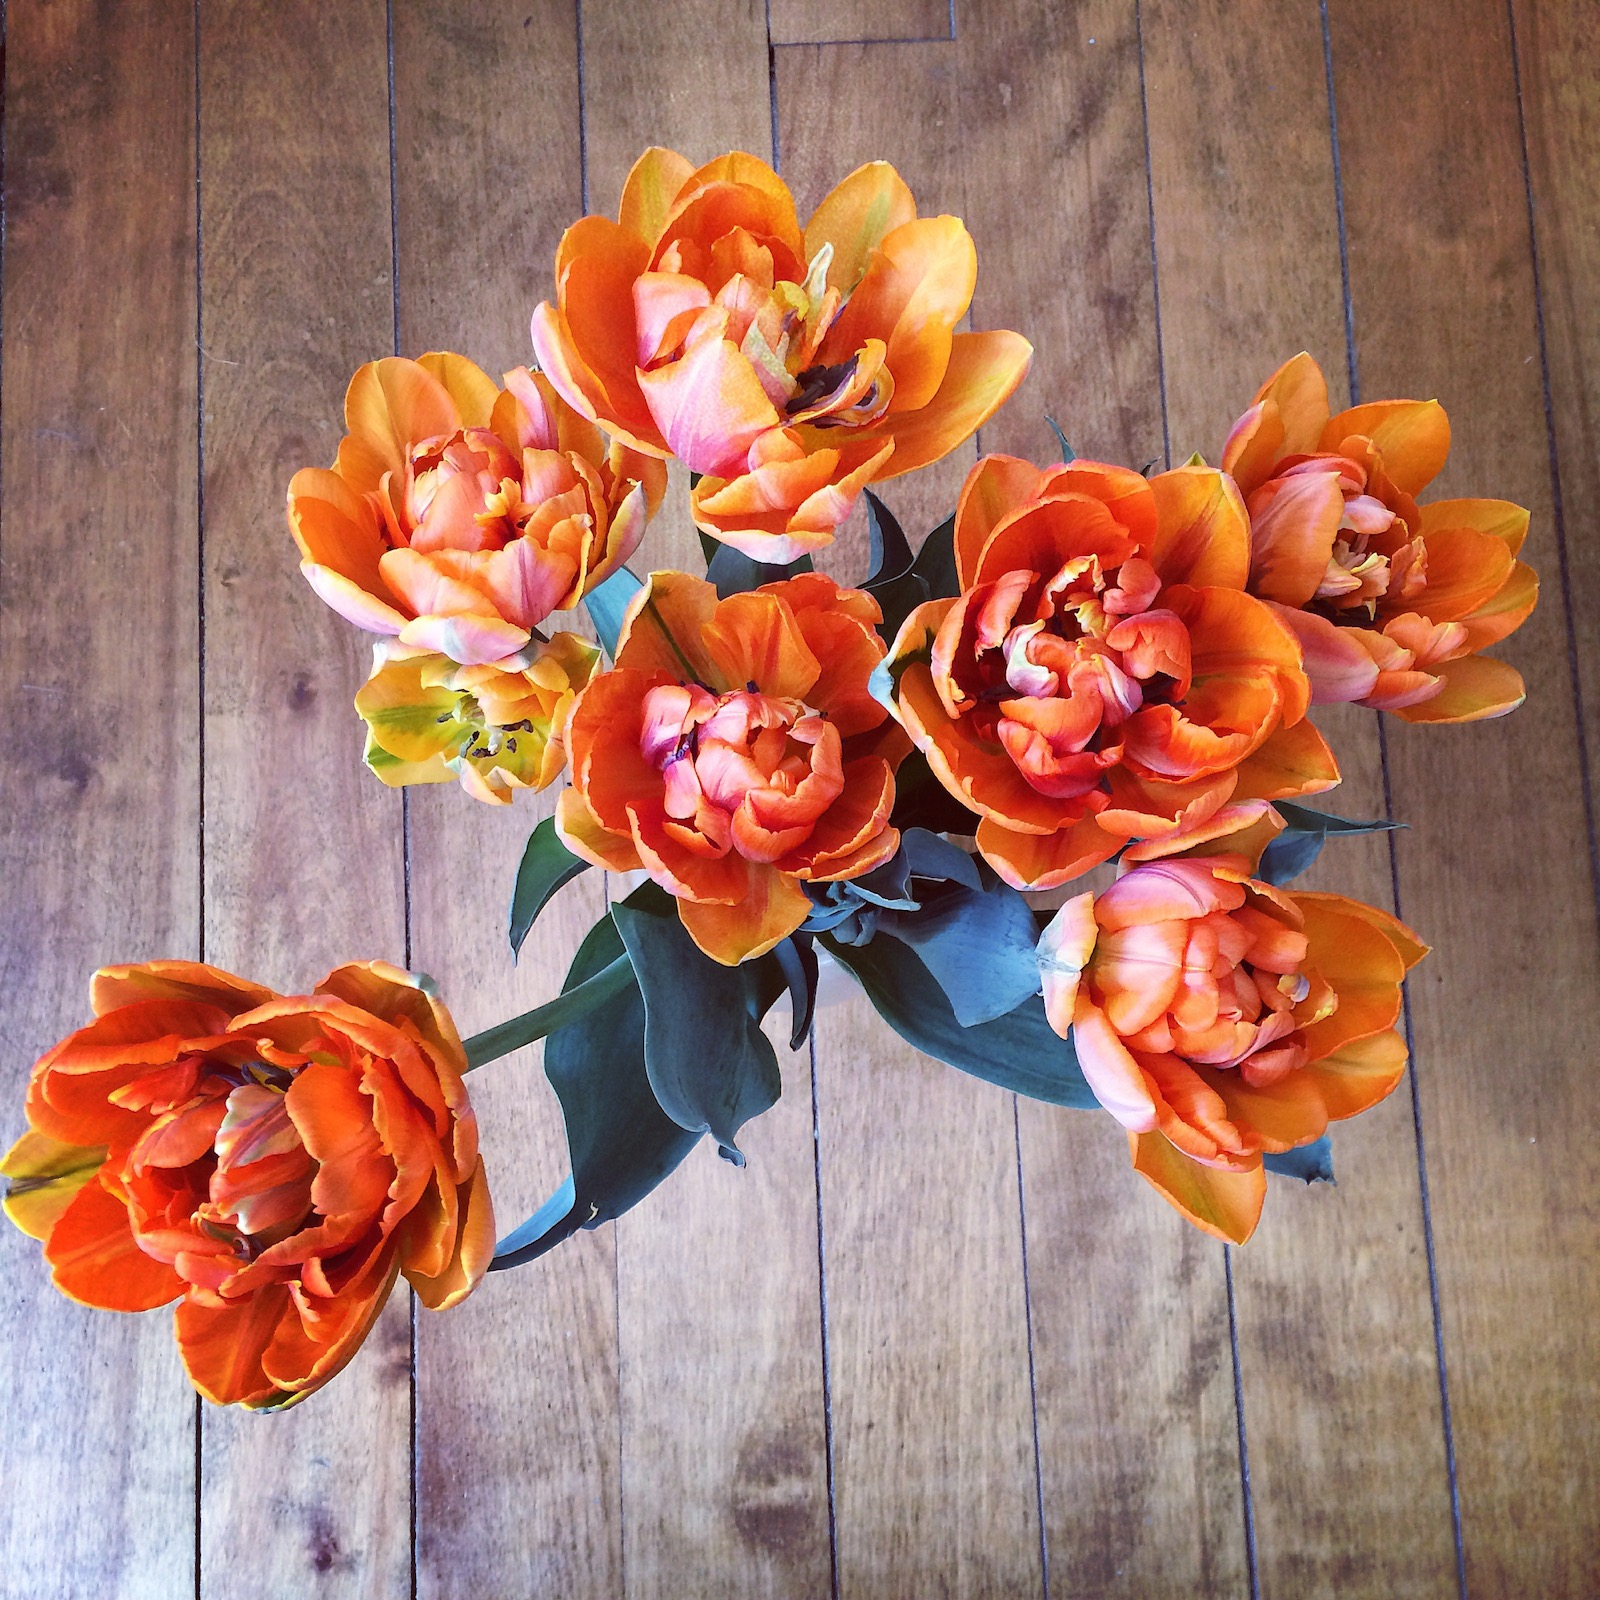 Tulips, Maine, orange princessm=